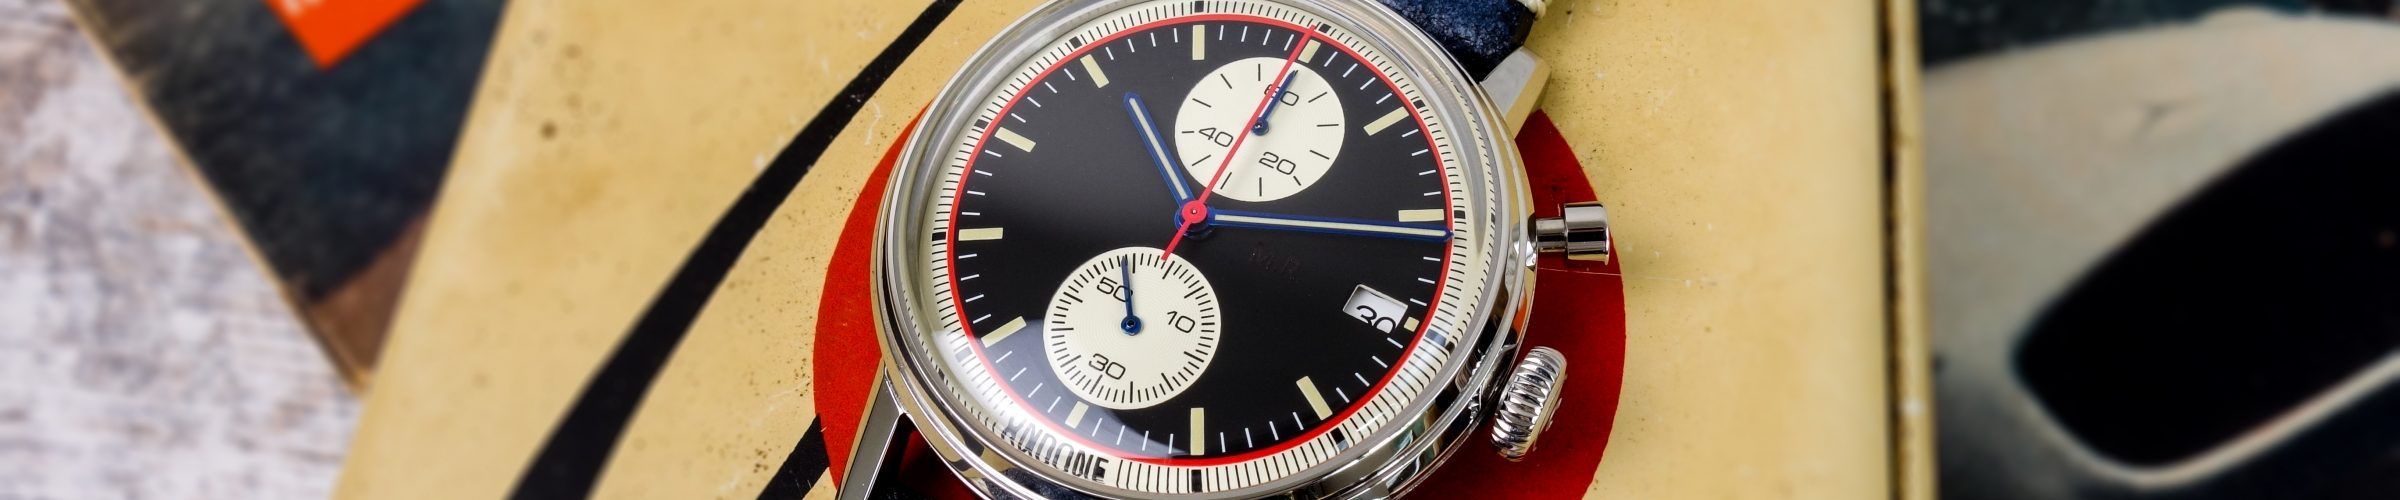 UNDONE Chronograph Konfigurator